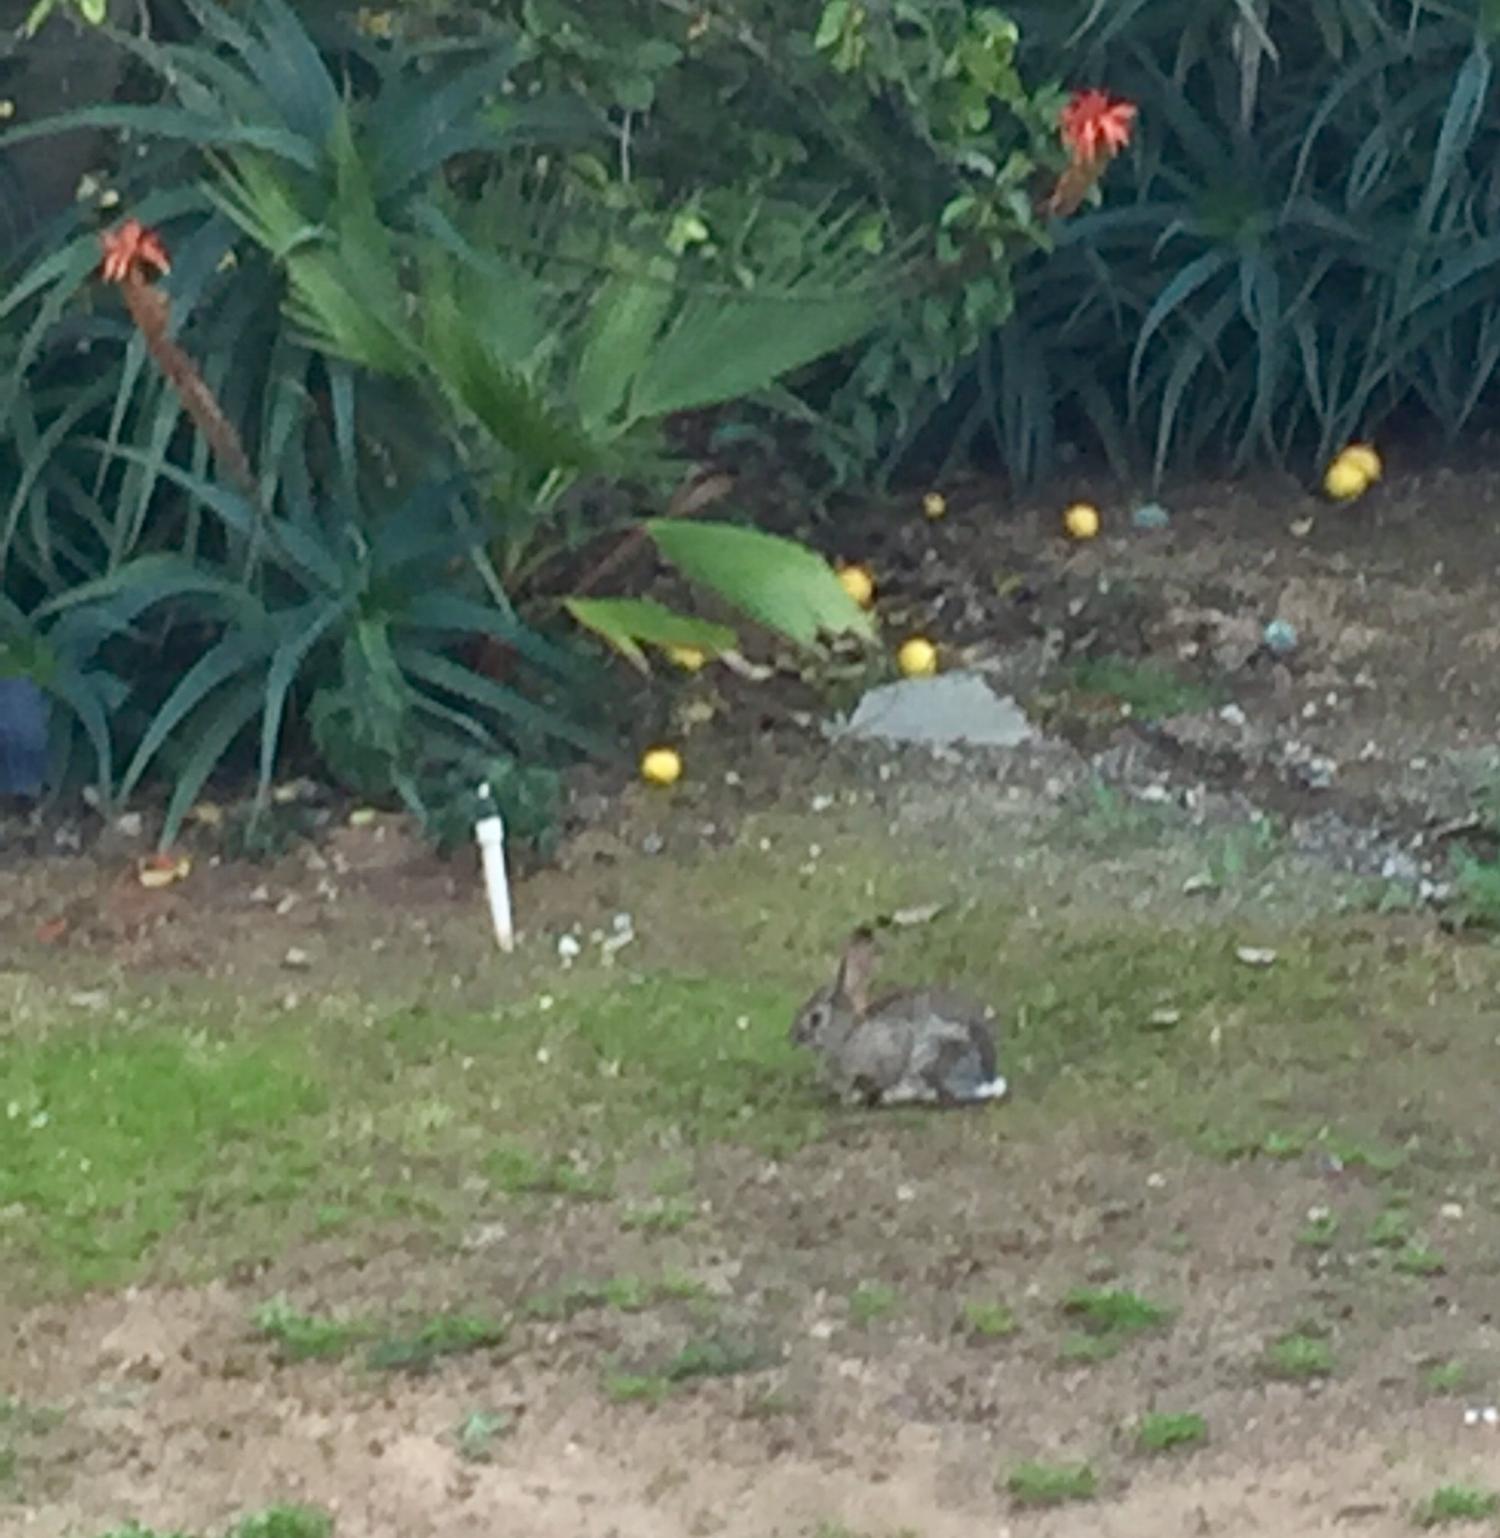 Another rabbit.